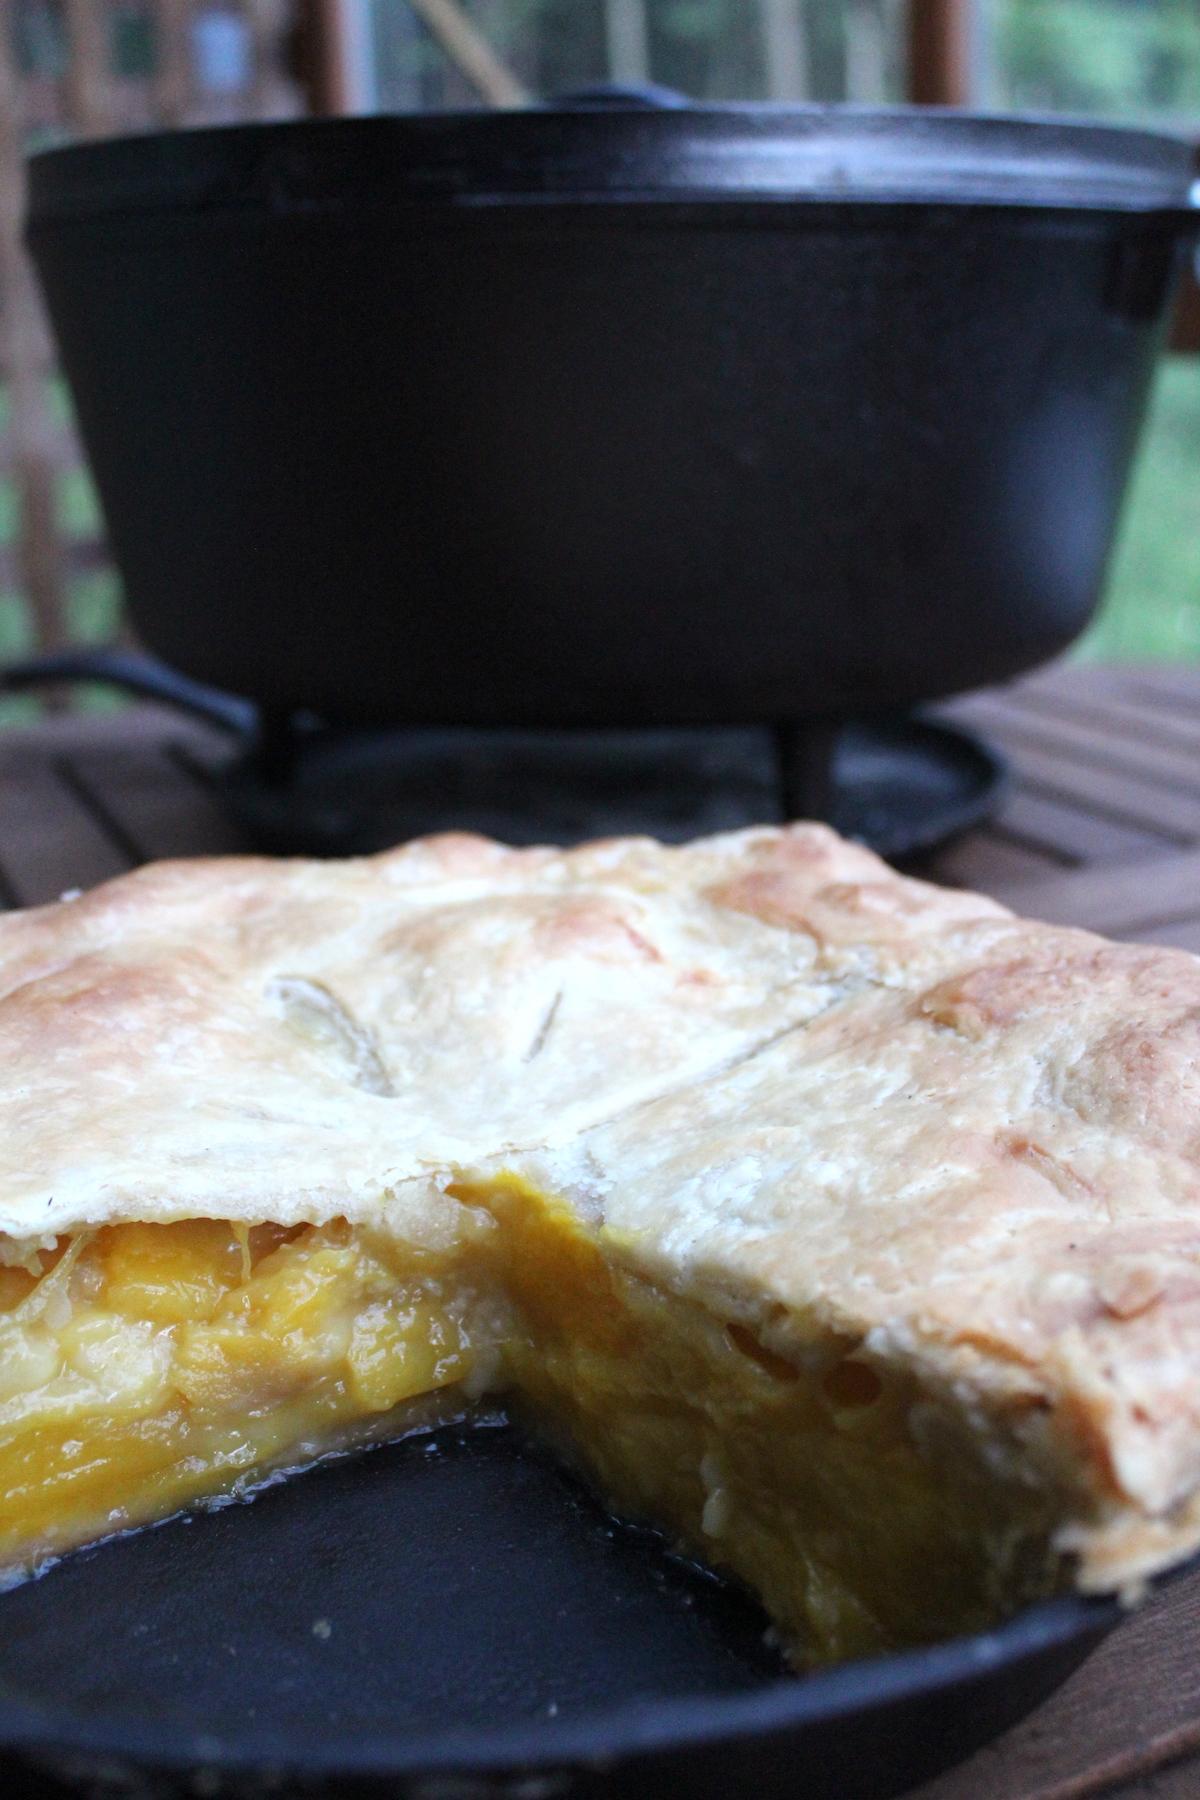 Baking a Pie in a Dutch Oven